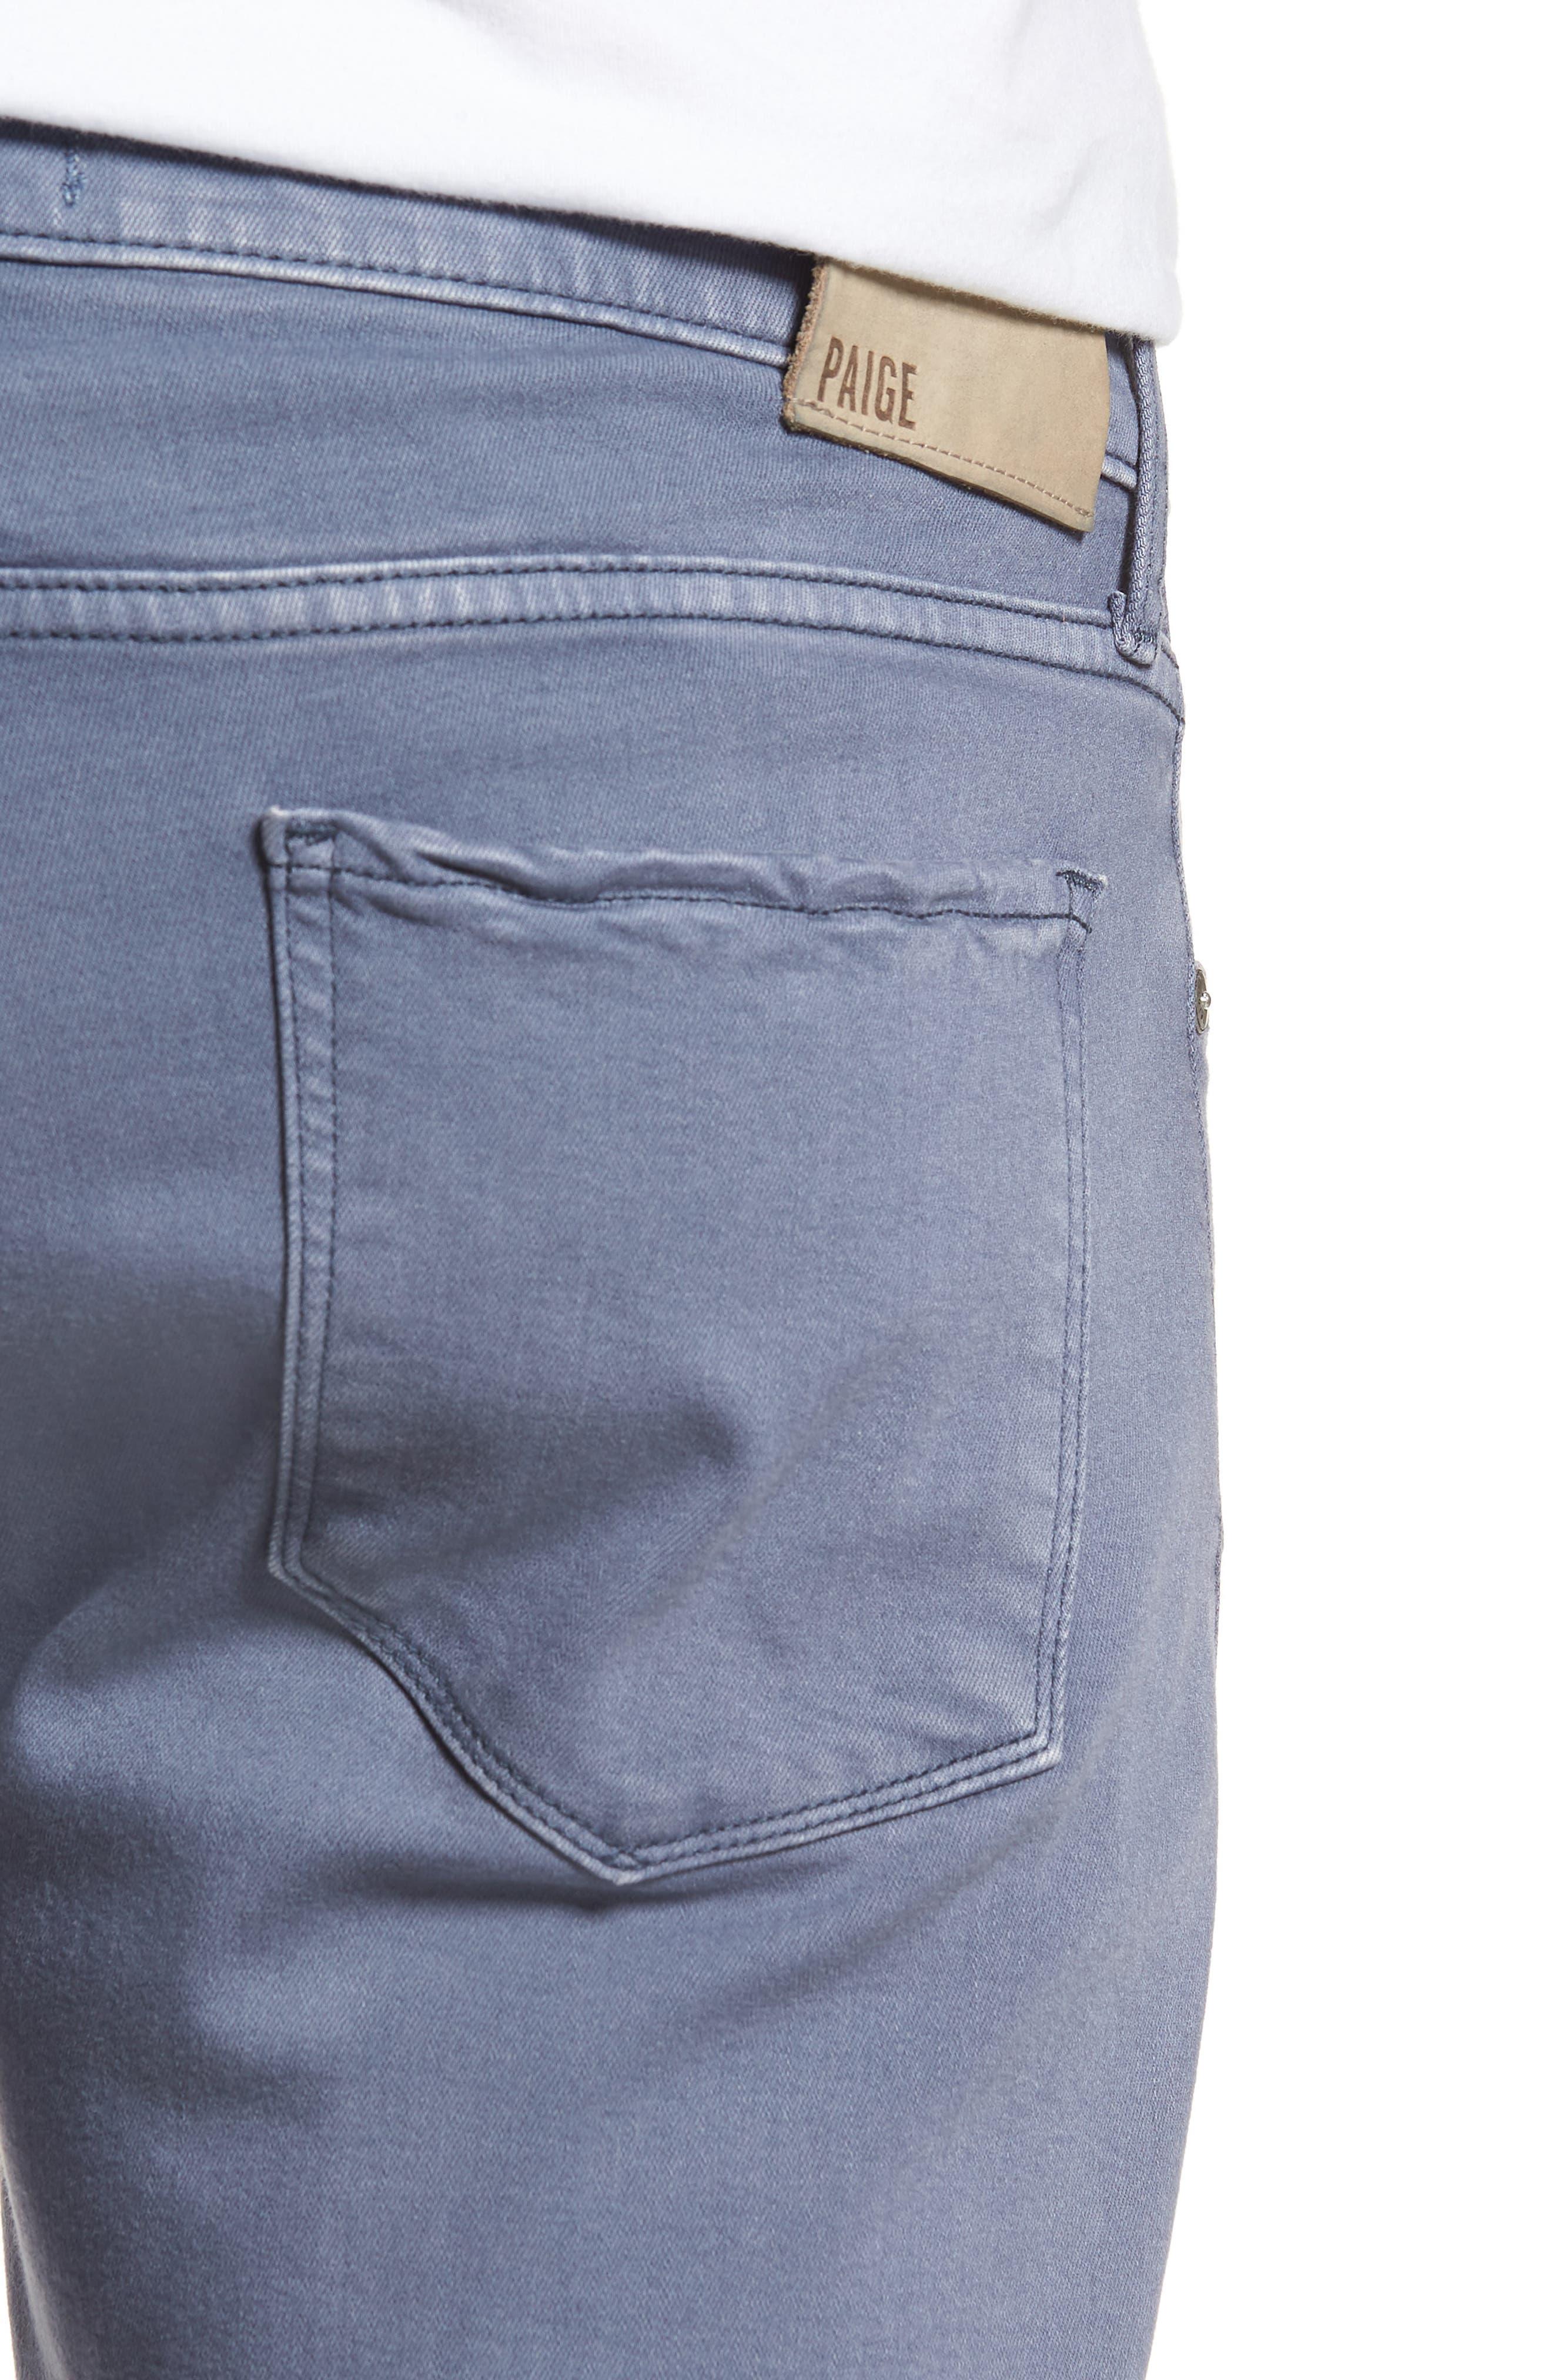 Transcend - Federal Slim Straight Leg Jeans,                             Alternate thumbnail 4, color,                             Vintage Smokey Blue